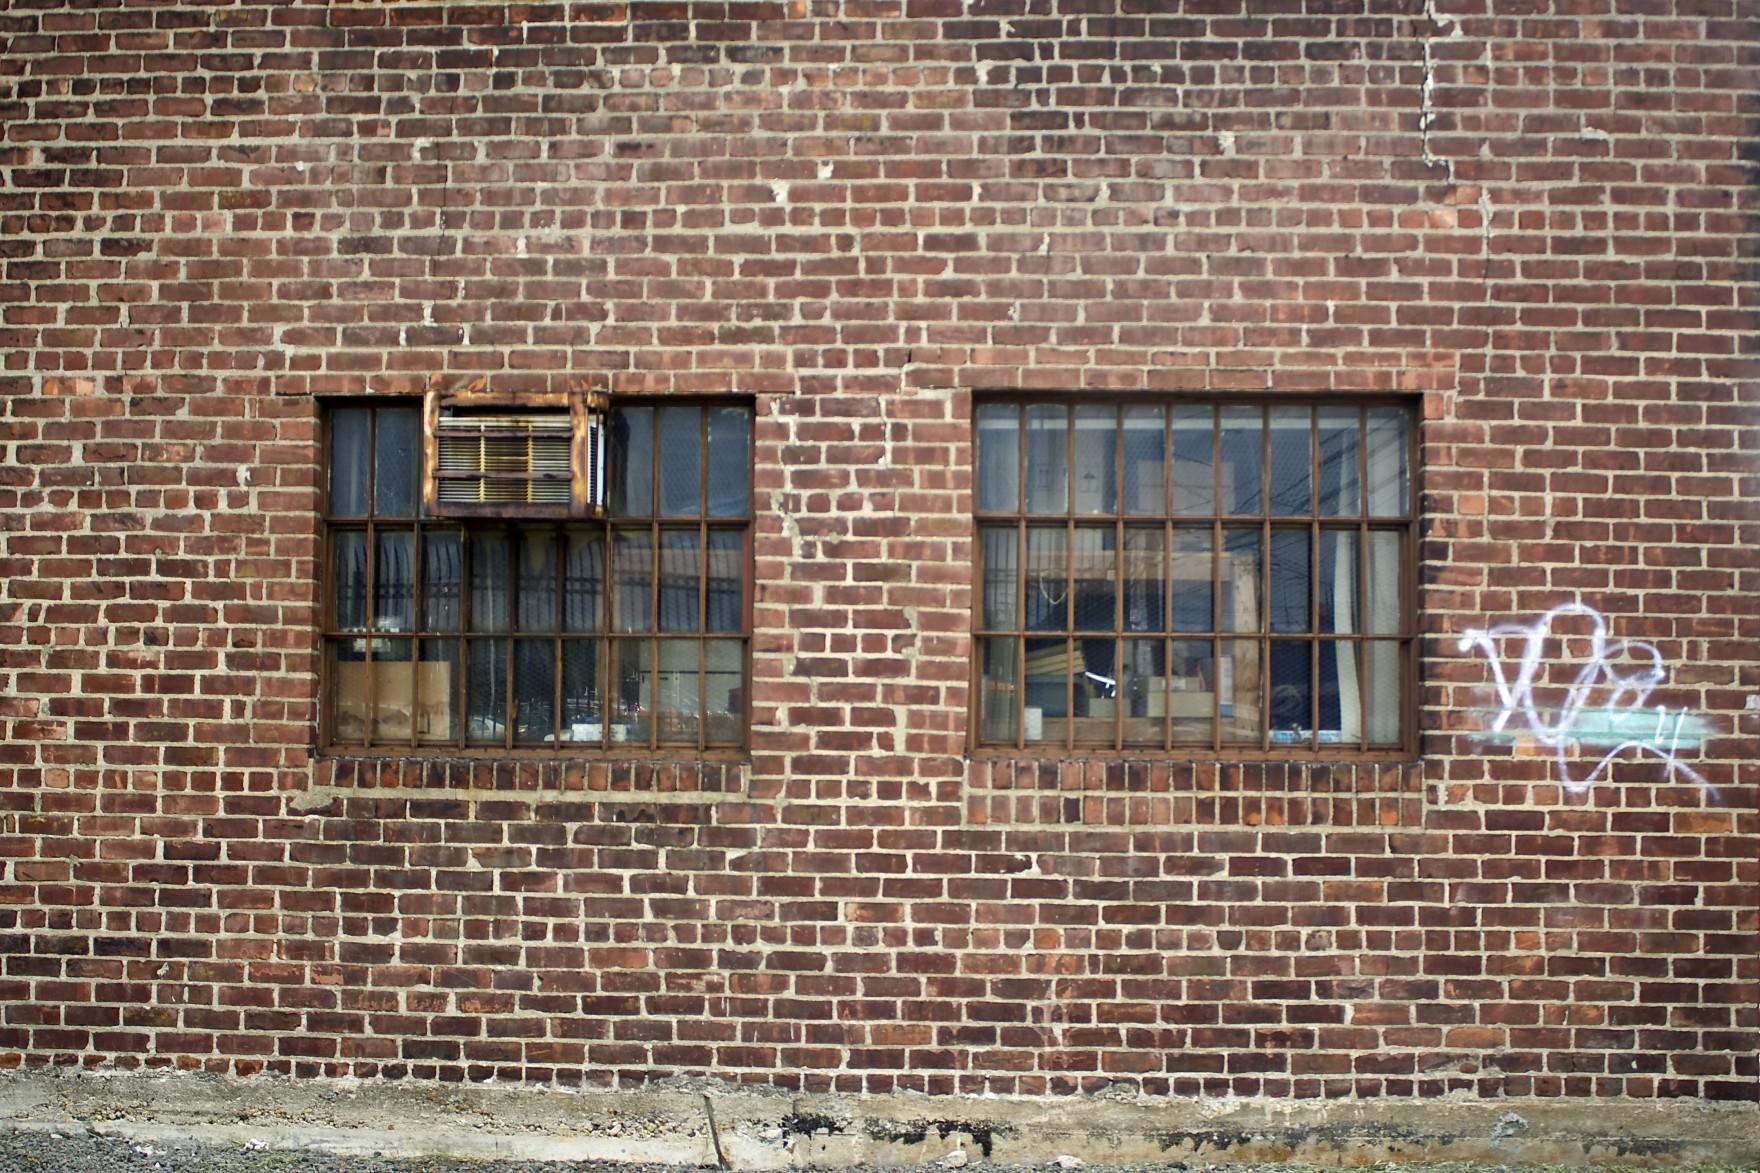 Industrial Brooklyn 12 - The Bored Vegetarian Bethany Pickard